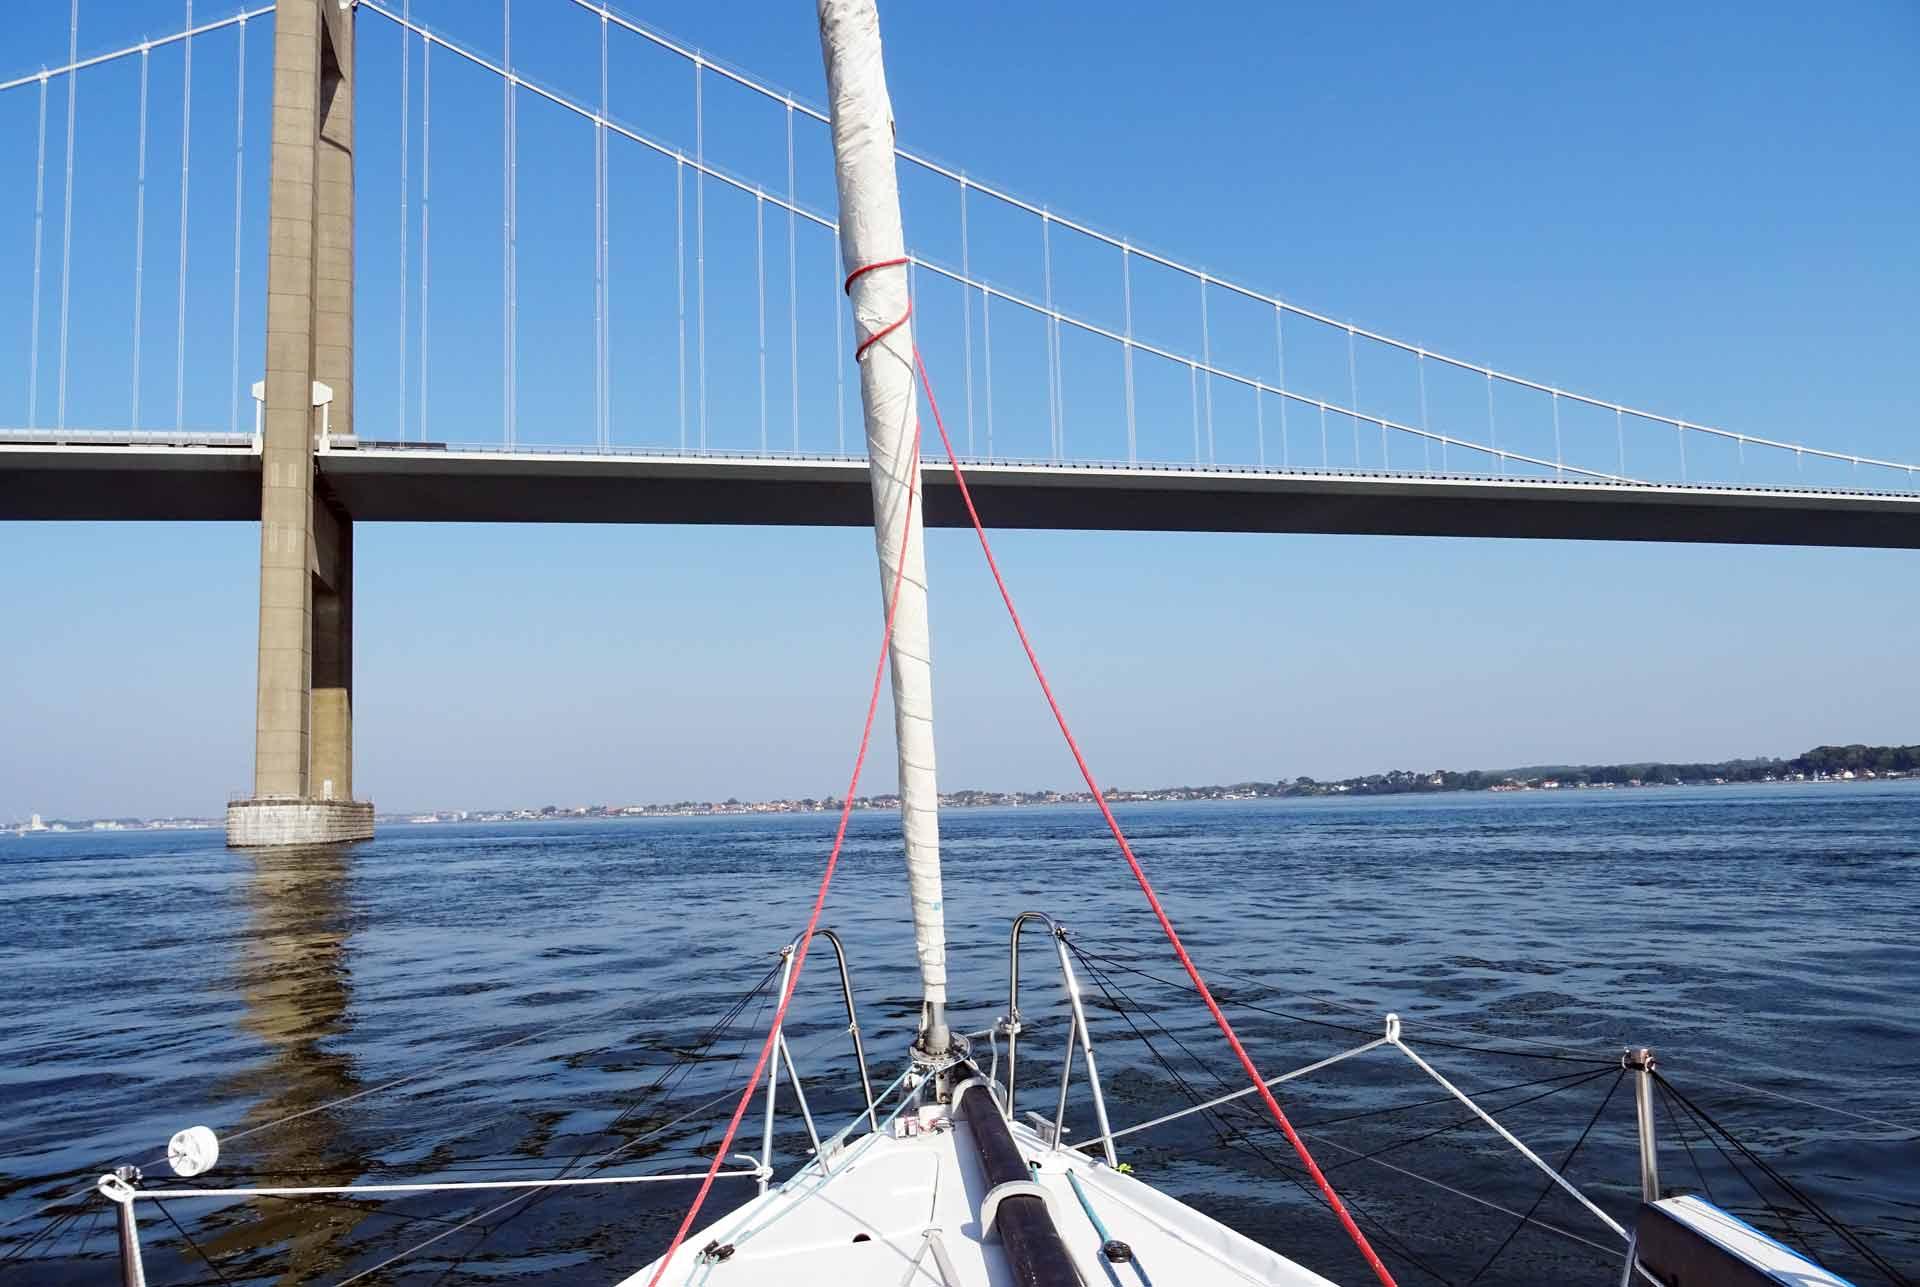 Crossing the Bridge in Middelfart: More wind in the open sea afterwards?